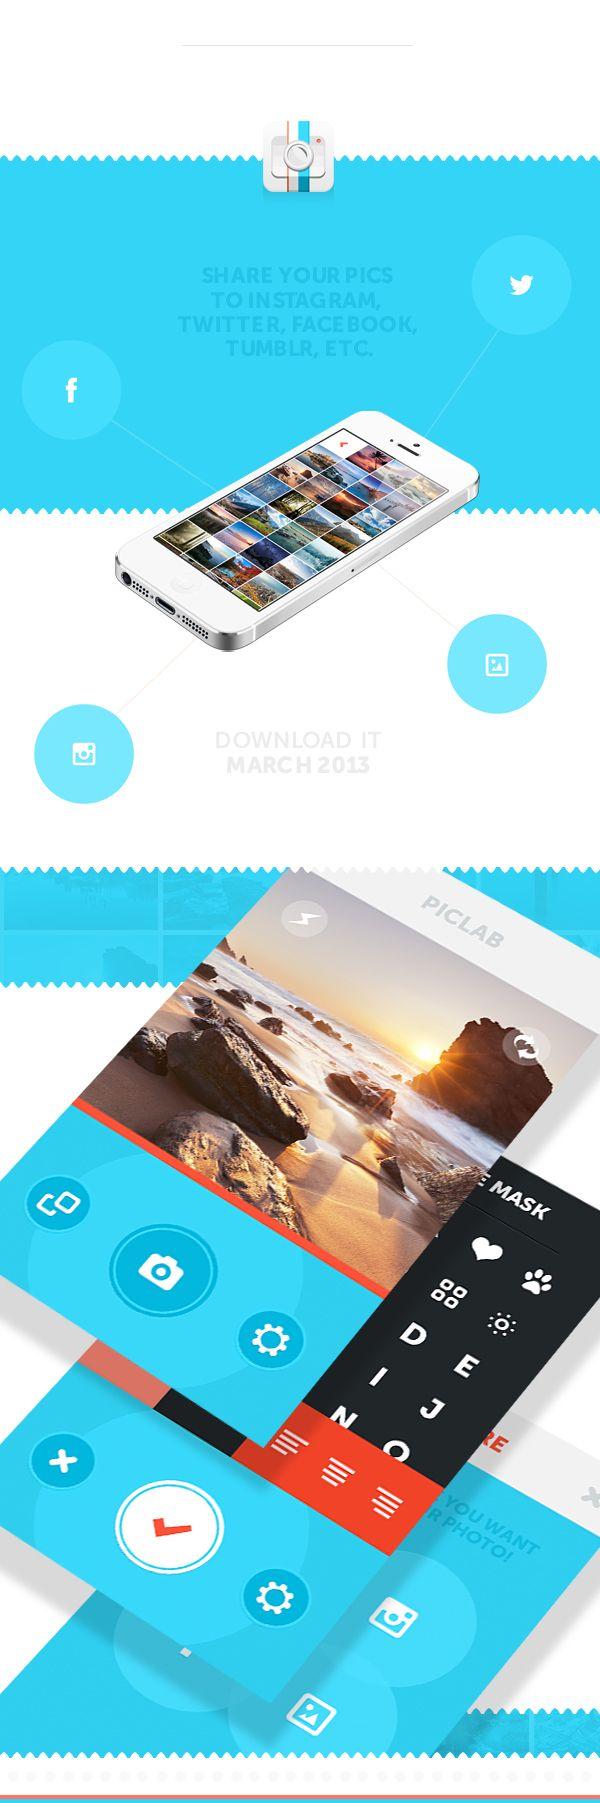 PicLab - Fun photo editing! by Roberto Nickson, via Behance